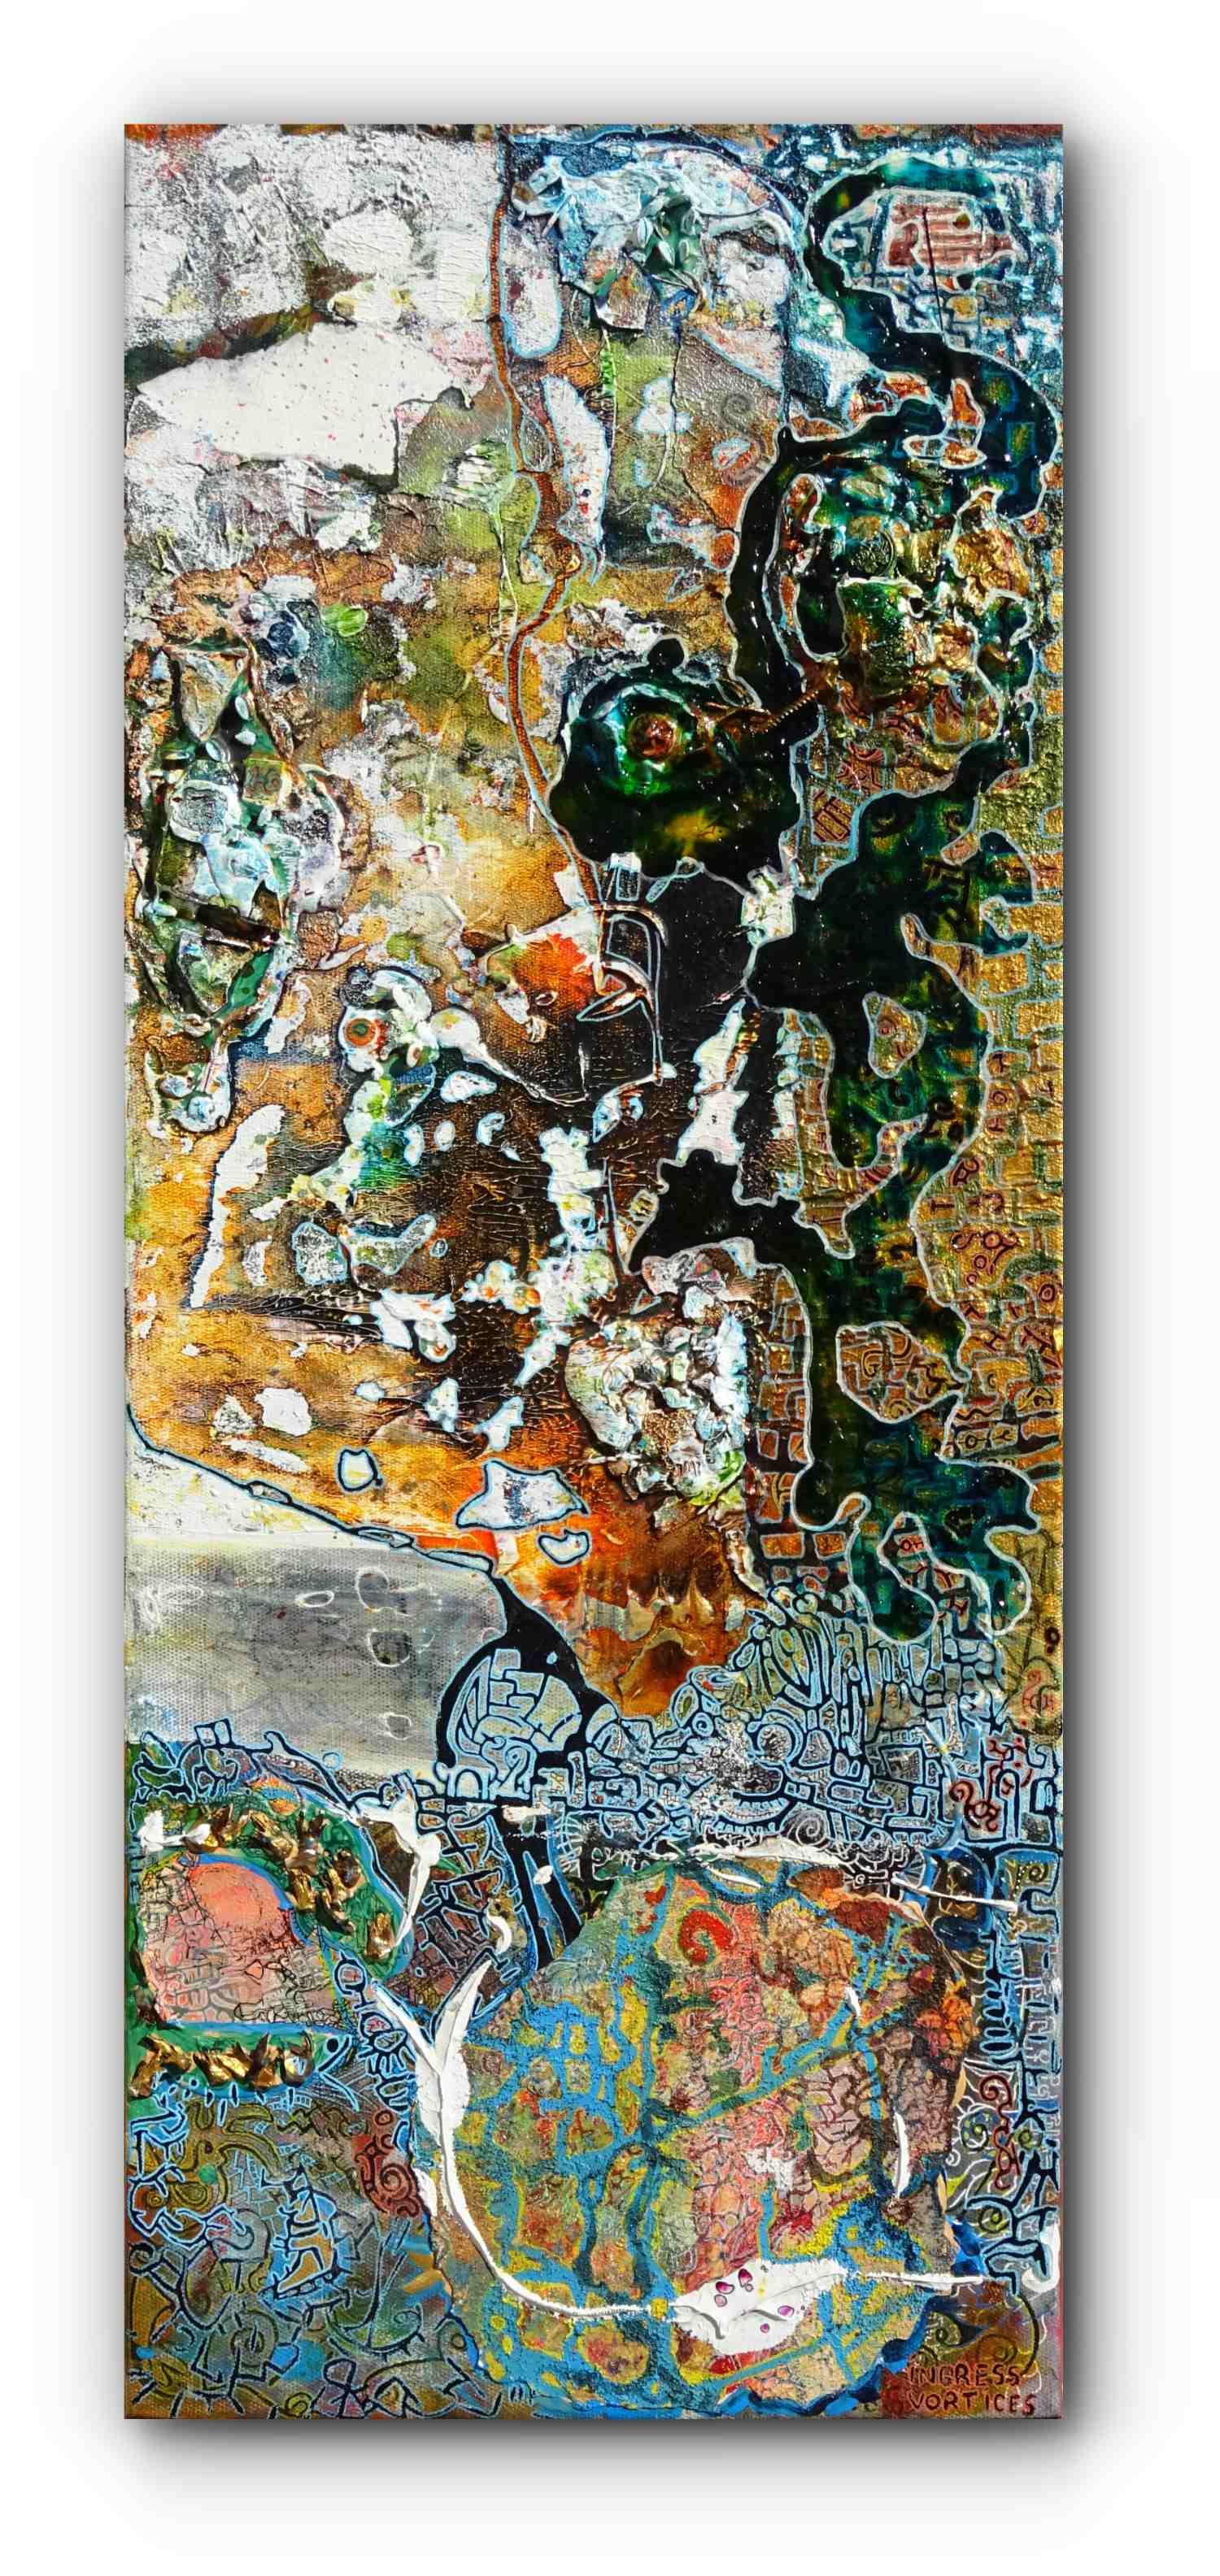 painting-ritual-seven-artist-duo-ingress-vortices.jpg